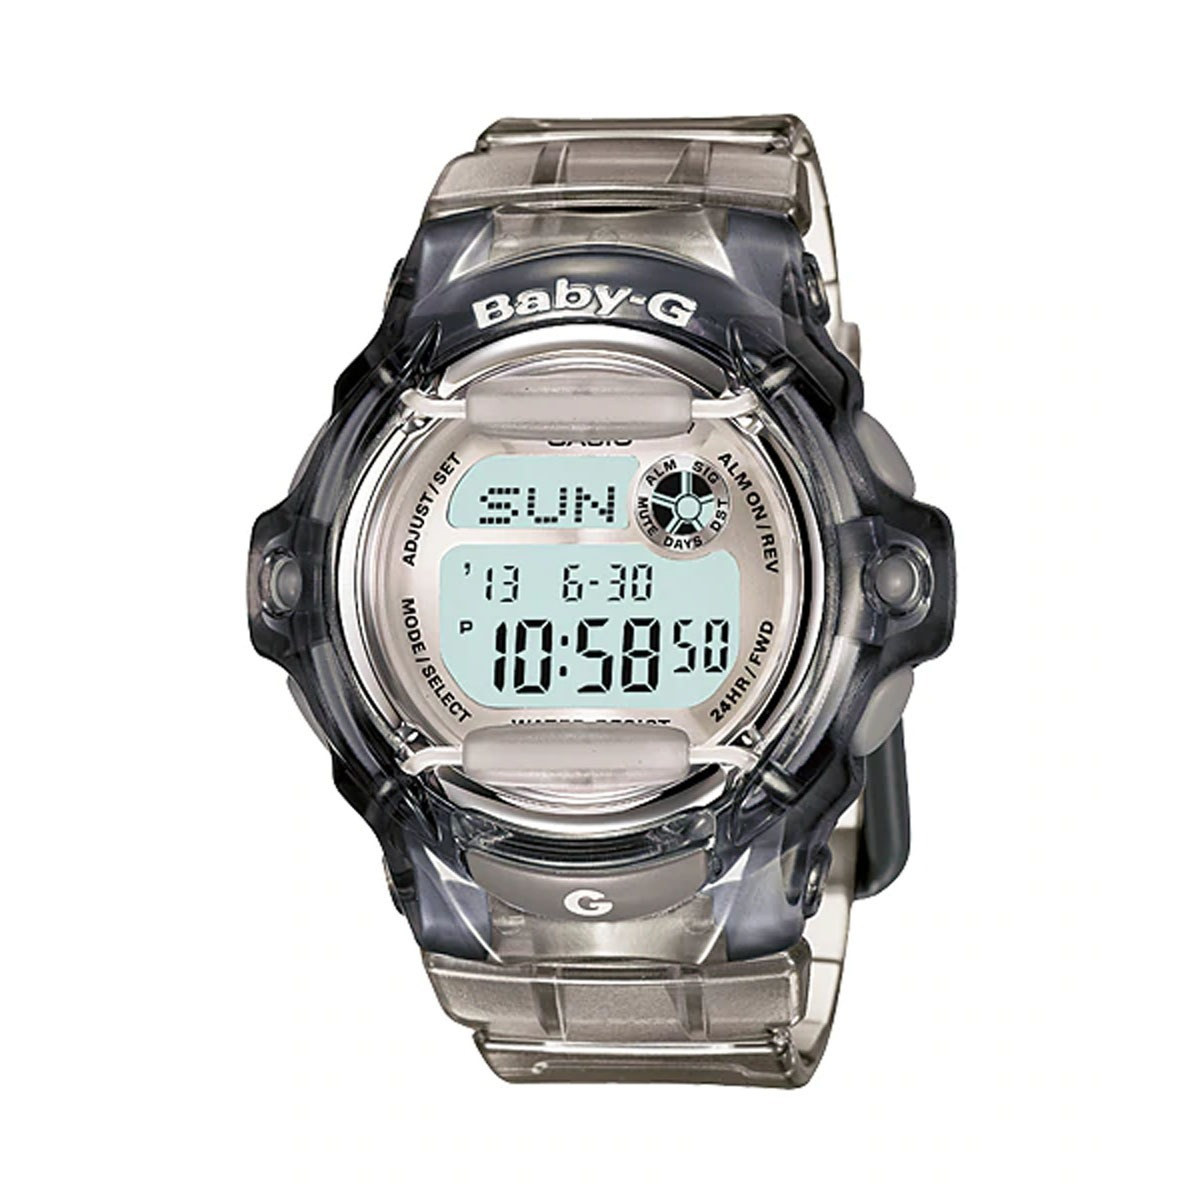 821f6a62fce2 reloj casio baby g bg-169r-8dr - envío gratis. Cargando zoom.